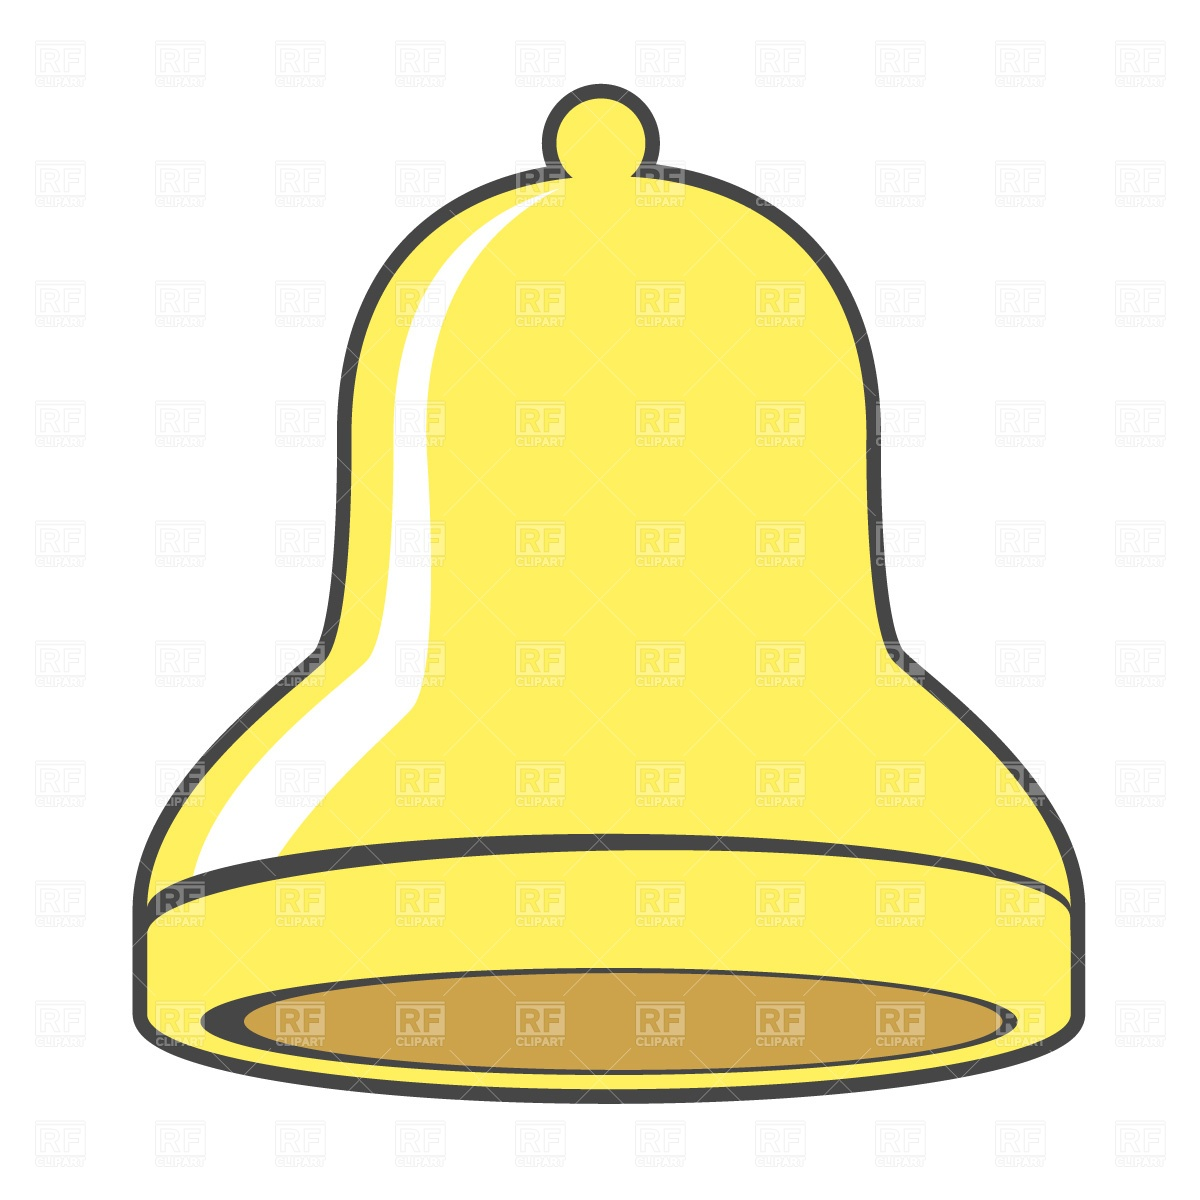 1200x1200 Golden Christmas bell Free Vector Clip Art Image